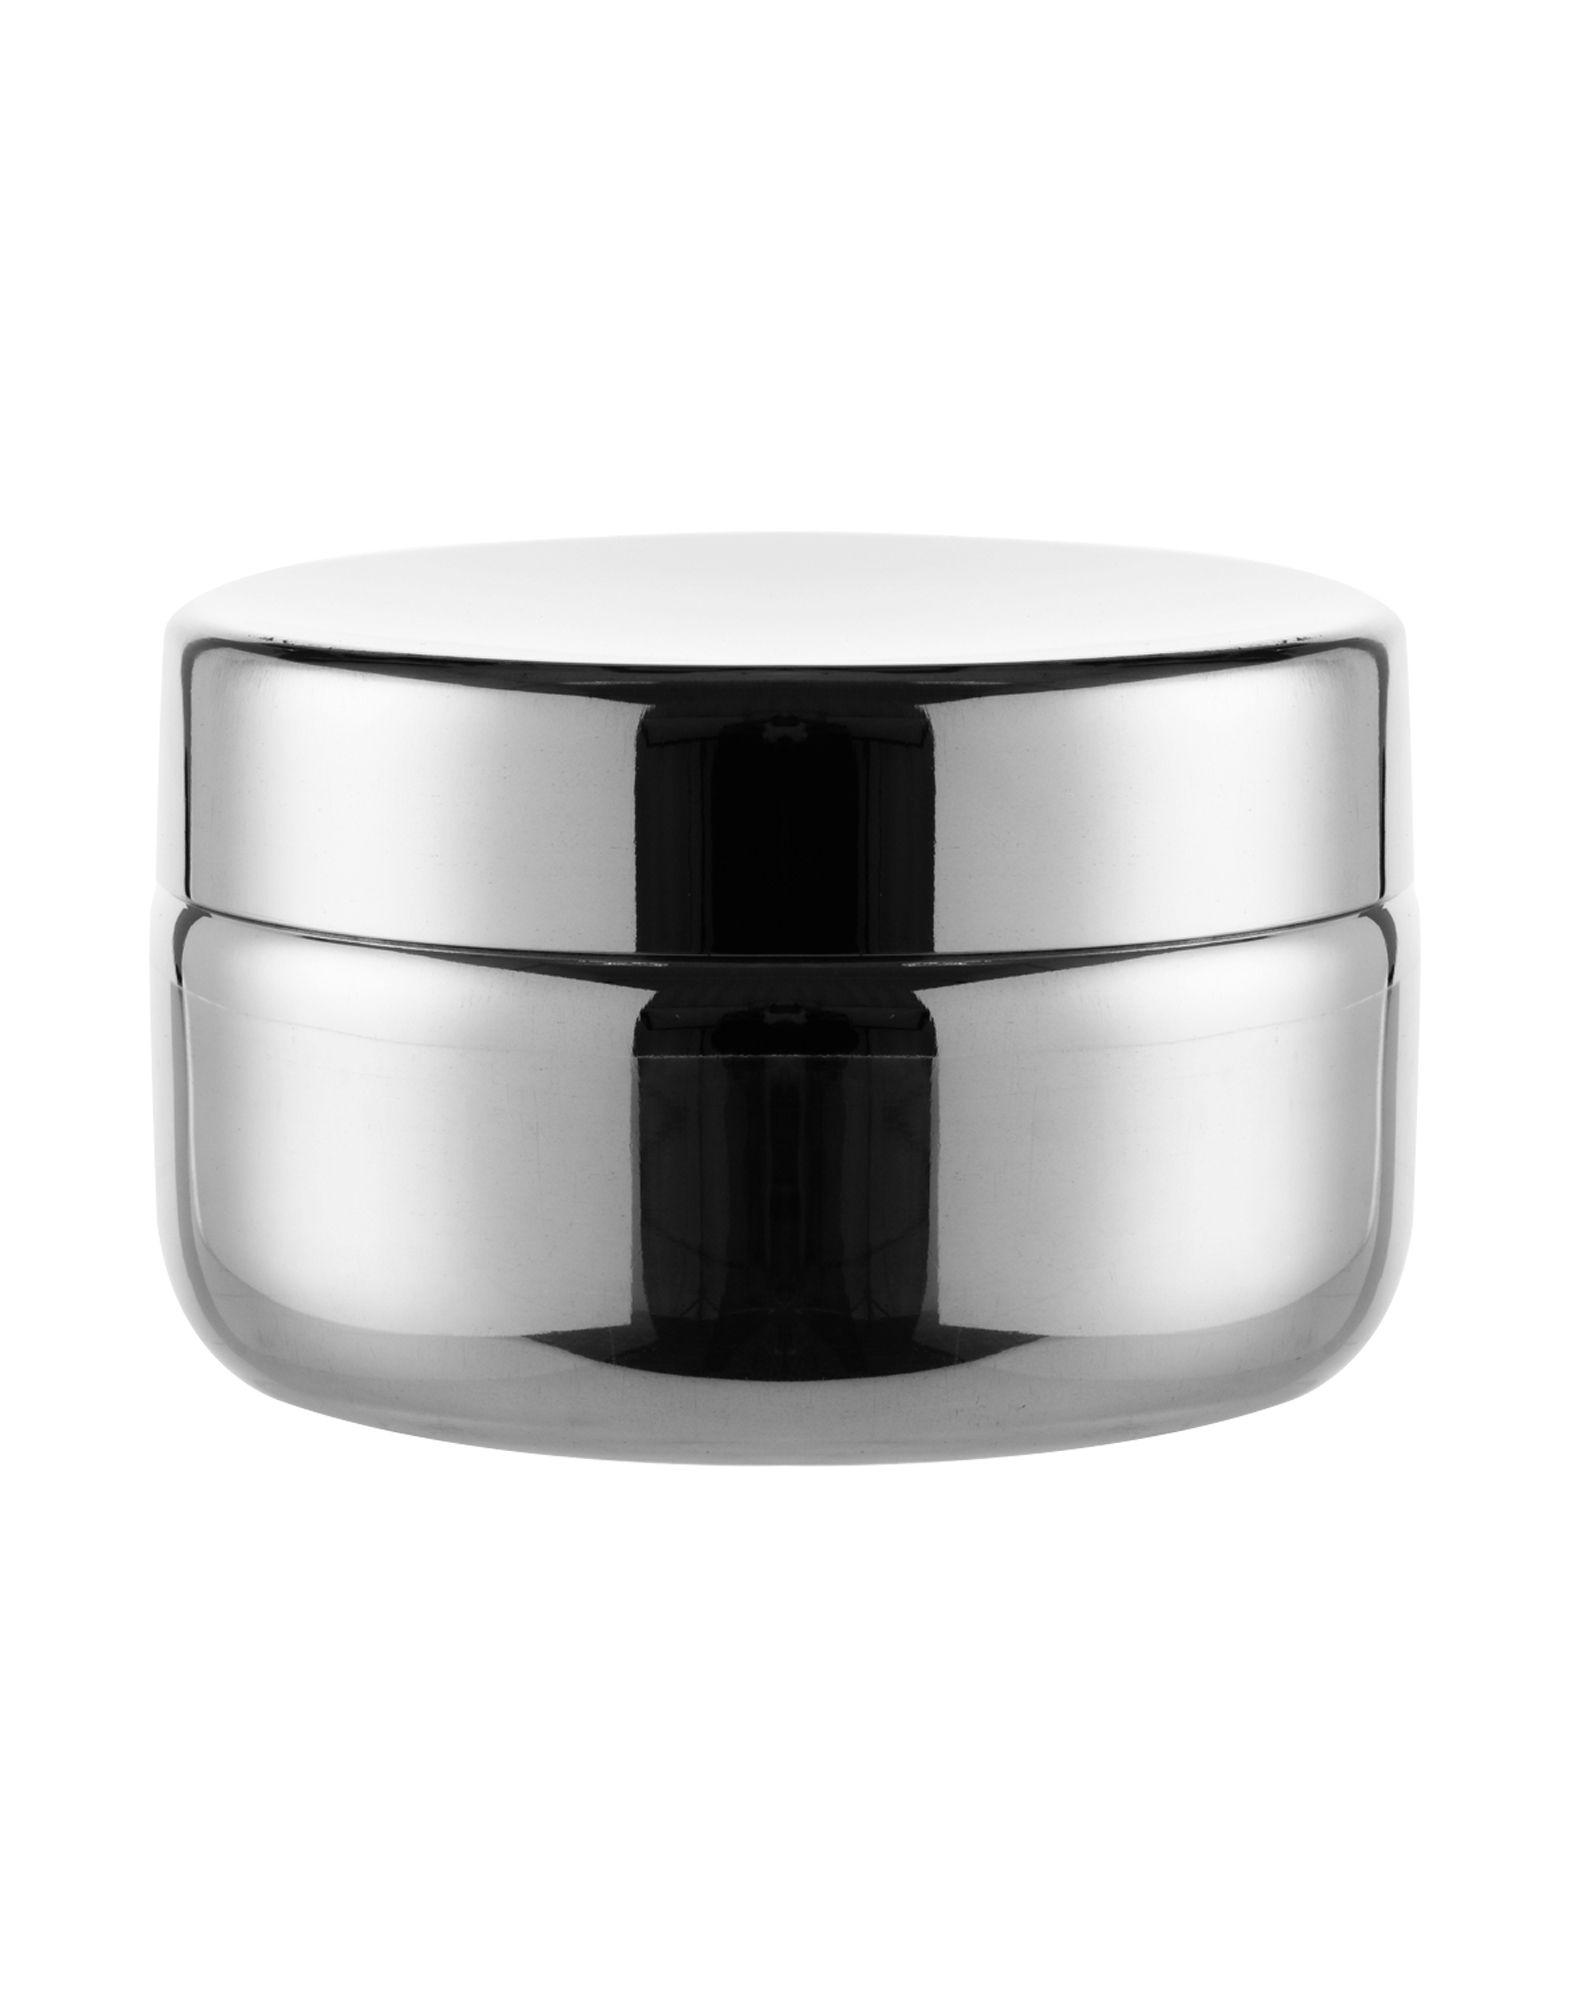 MIRANDA WATKINS Unisex Objekte Farbe Silber Größe 1